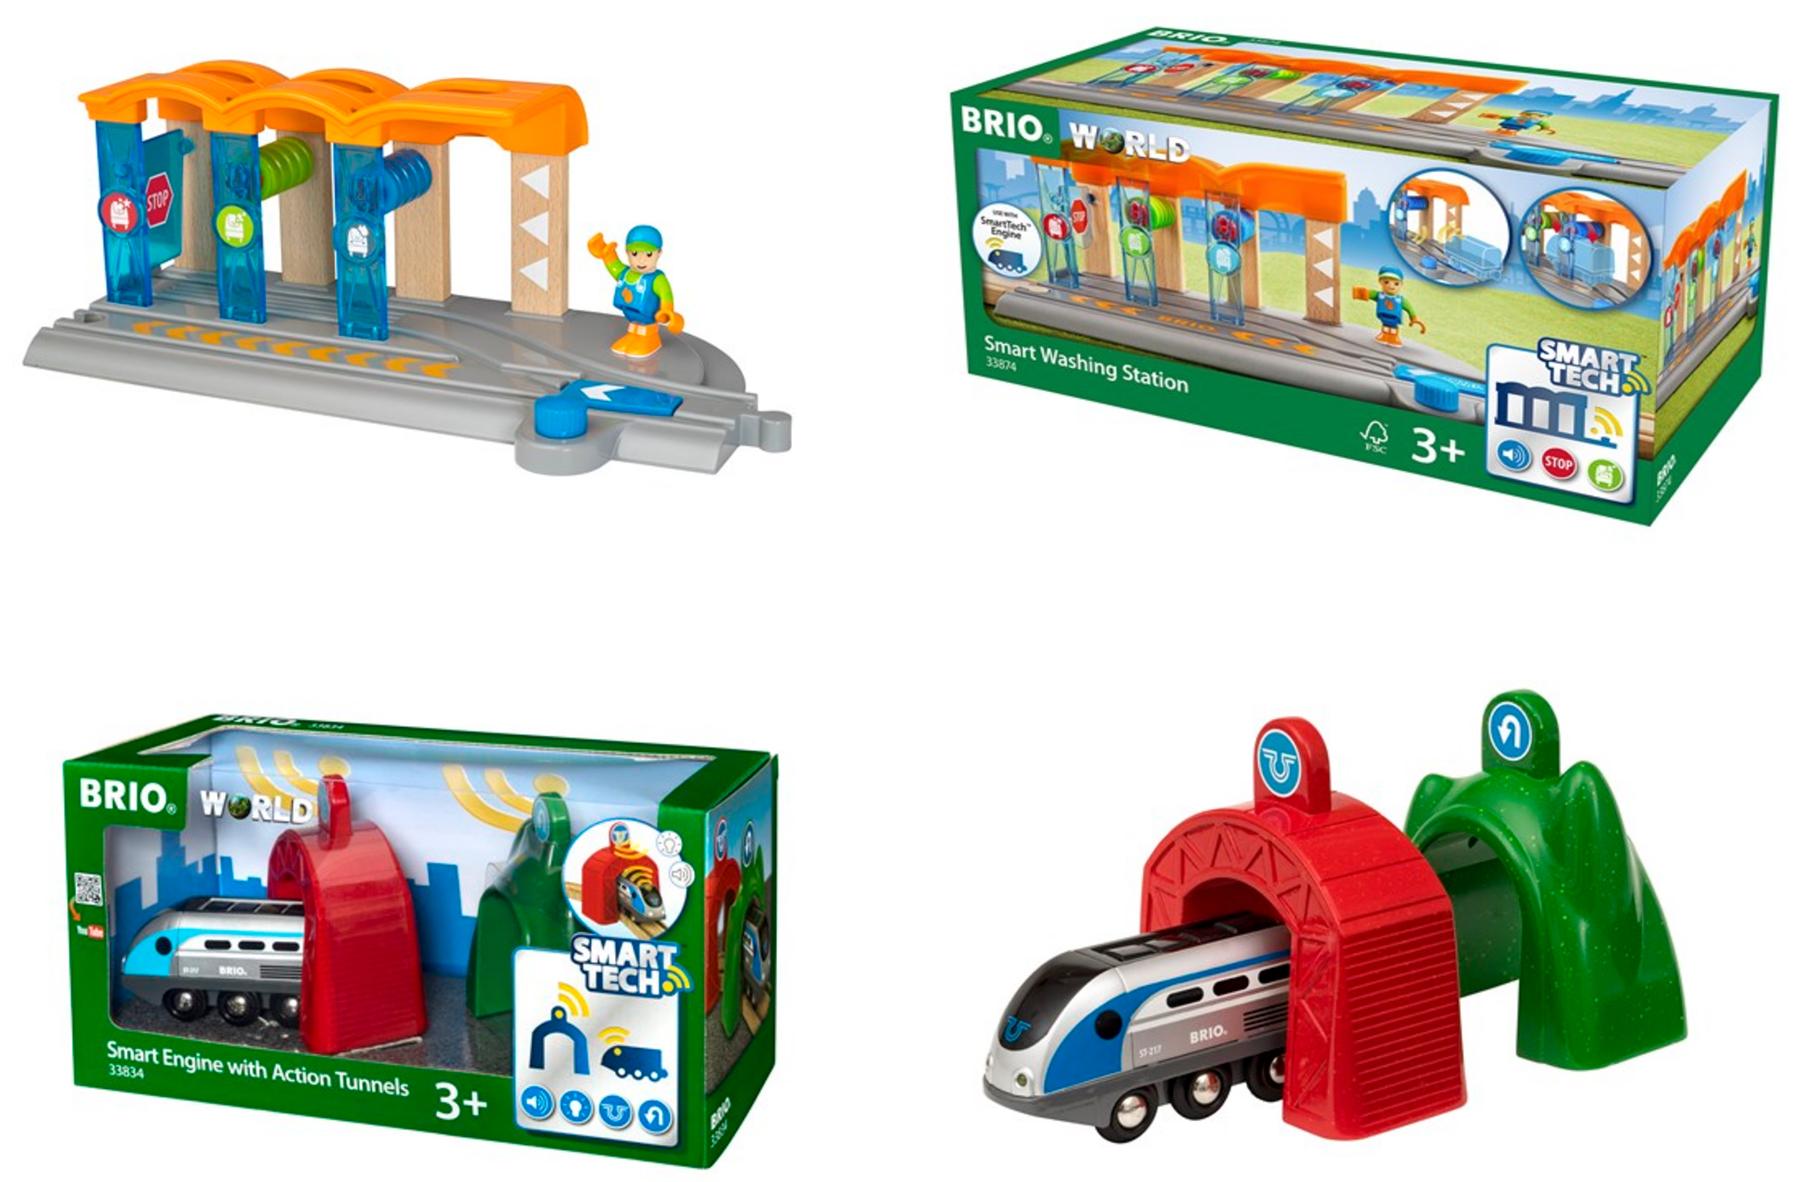 Brio Smart Tech Toys